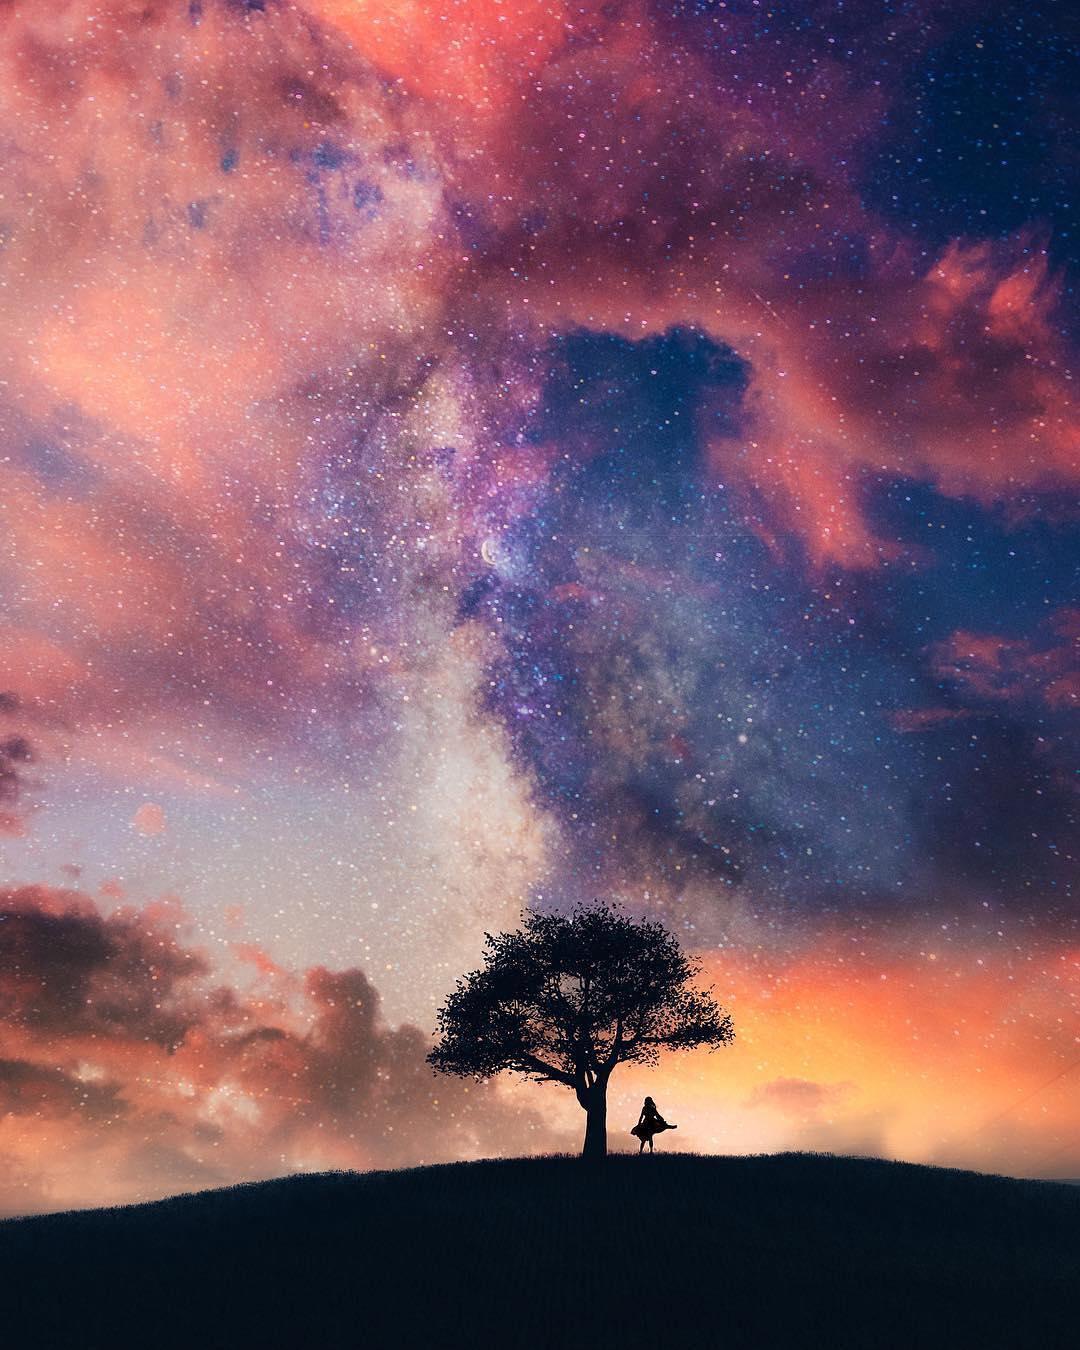 Фото Девушка стоит у дерева на фоне облачного неба